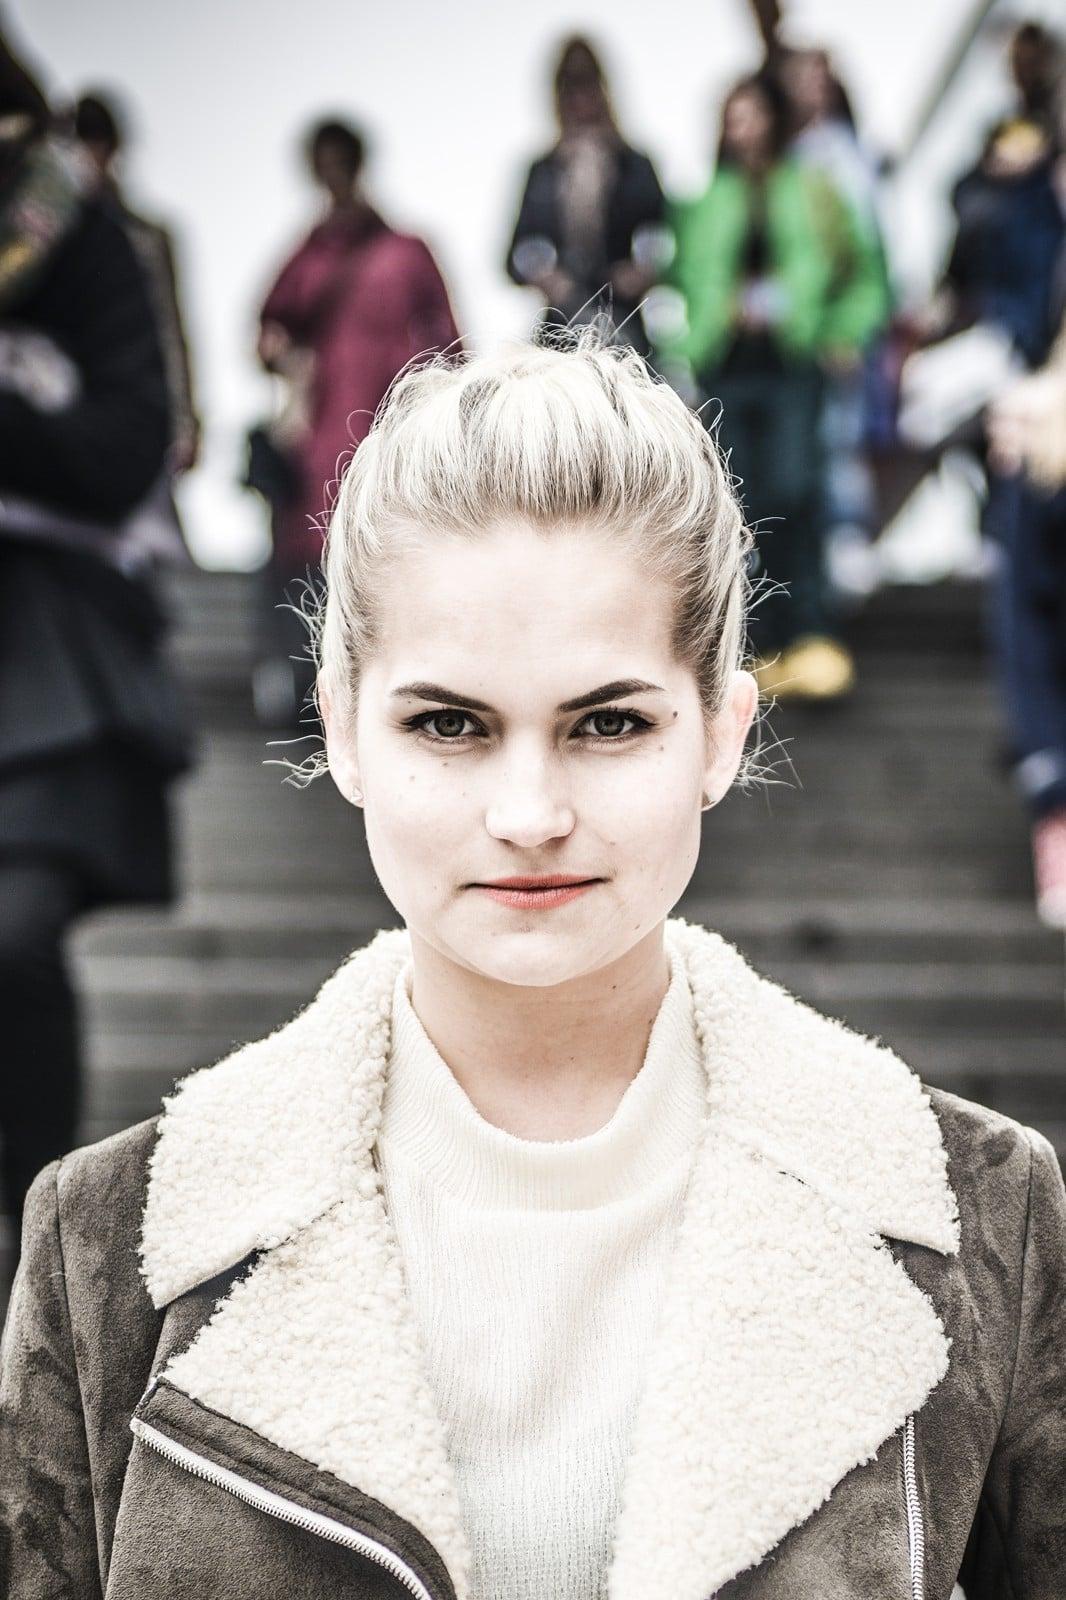 Tiffany Kronlöf